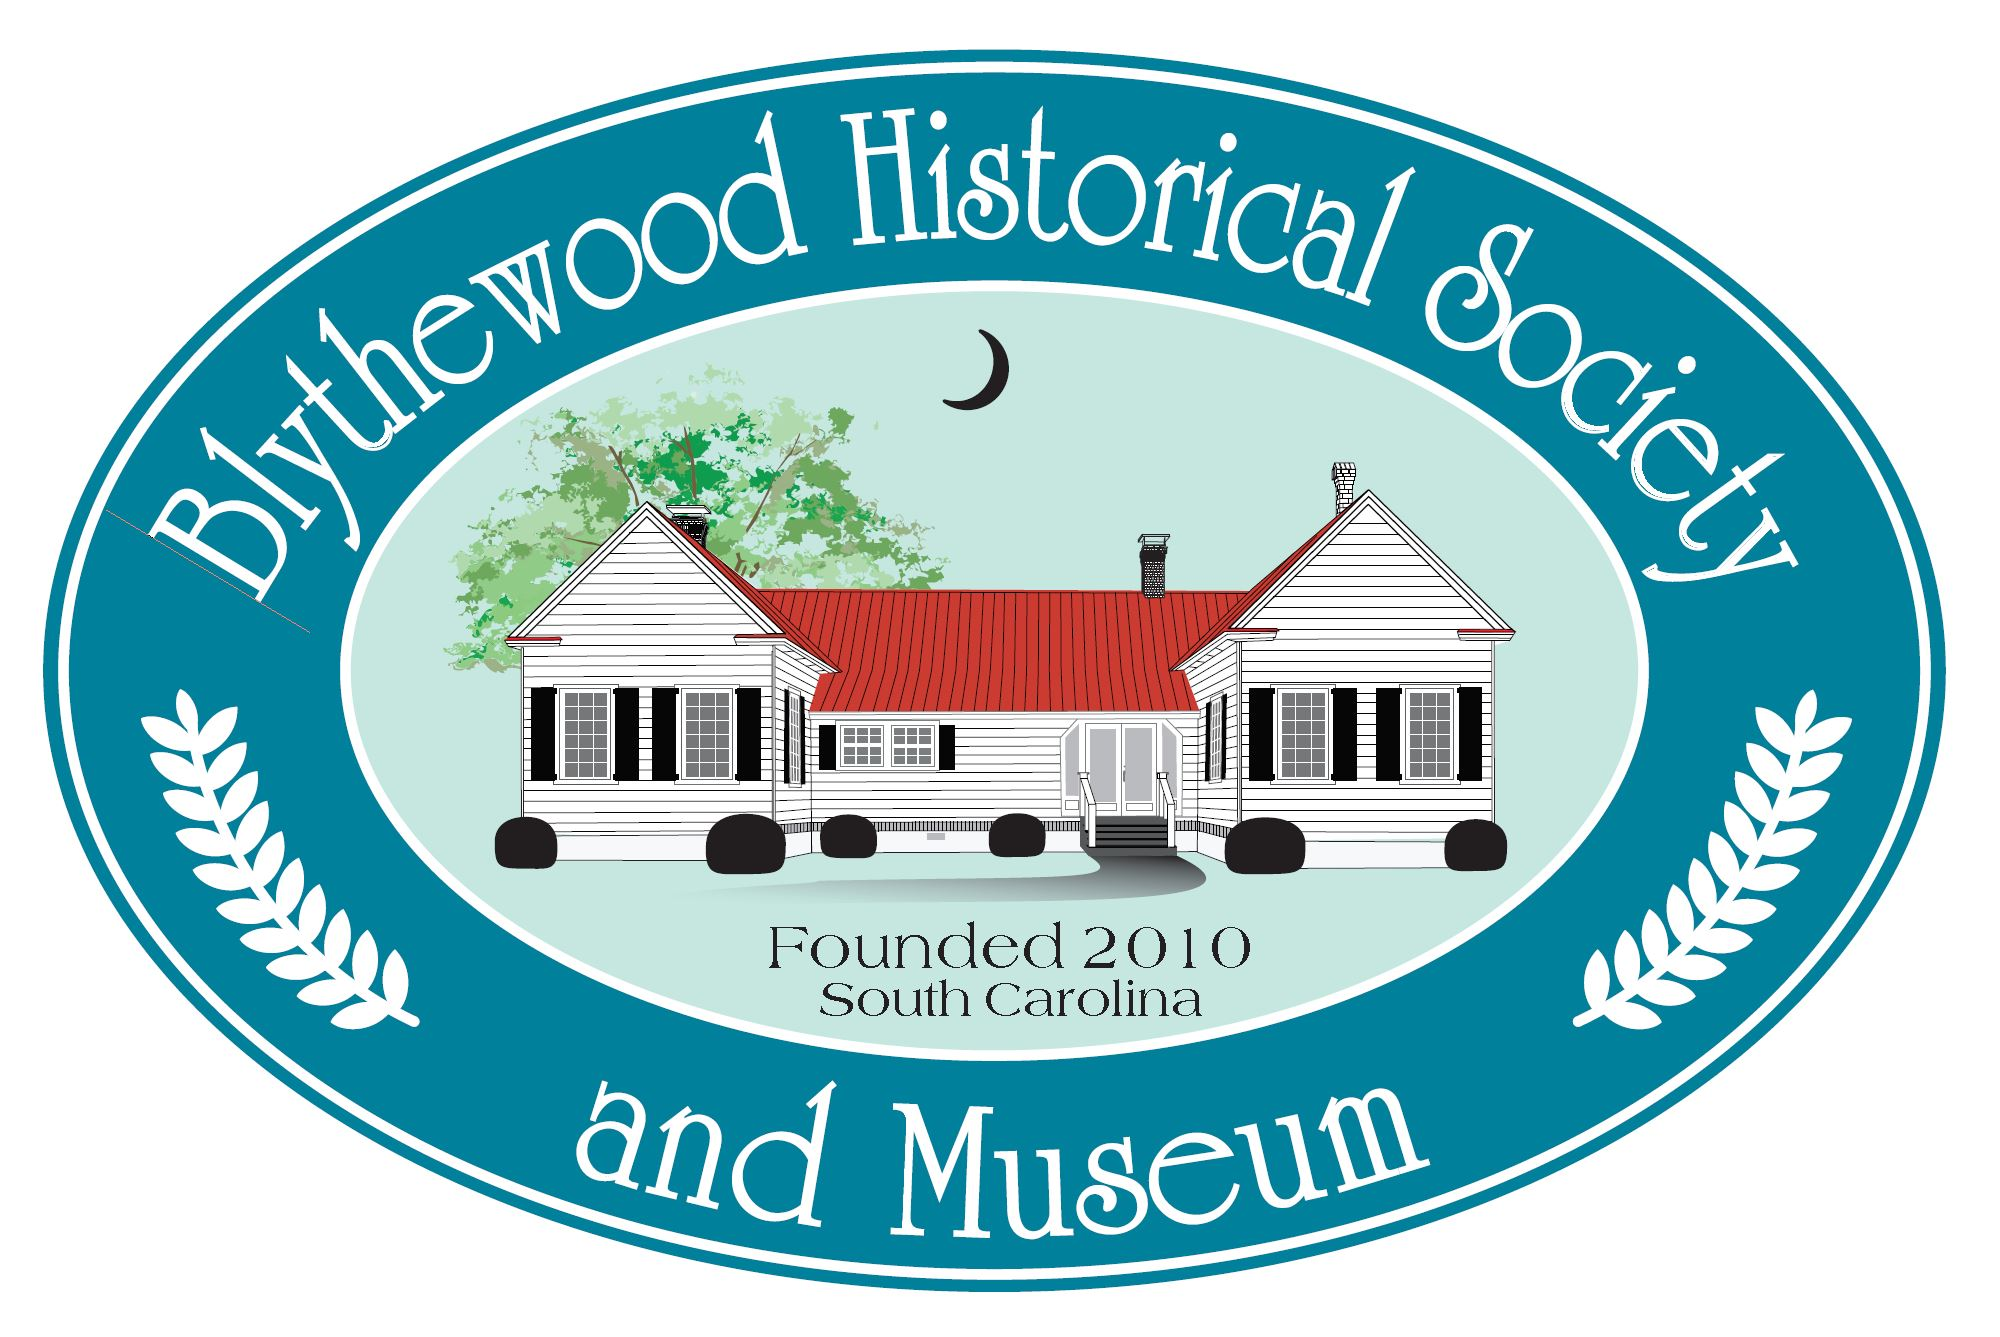 blythewood historical society